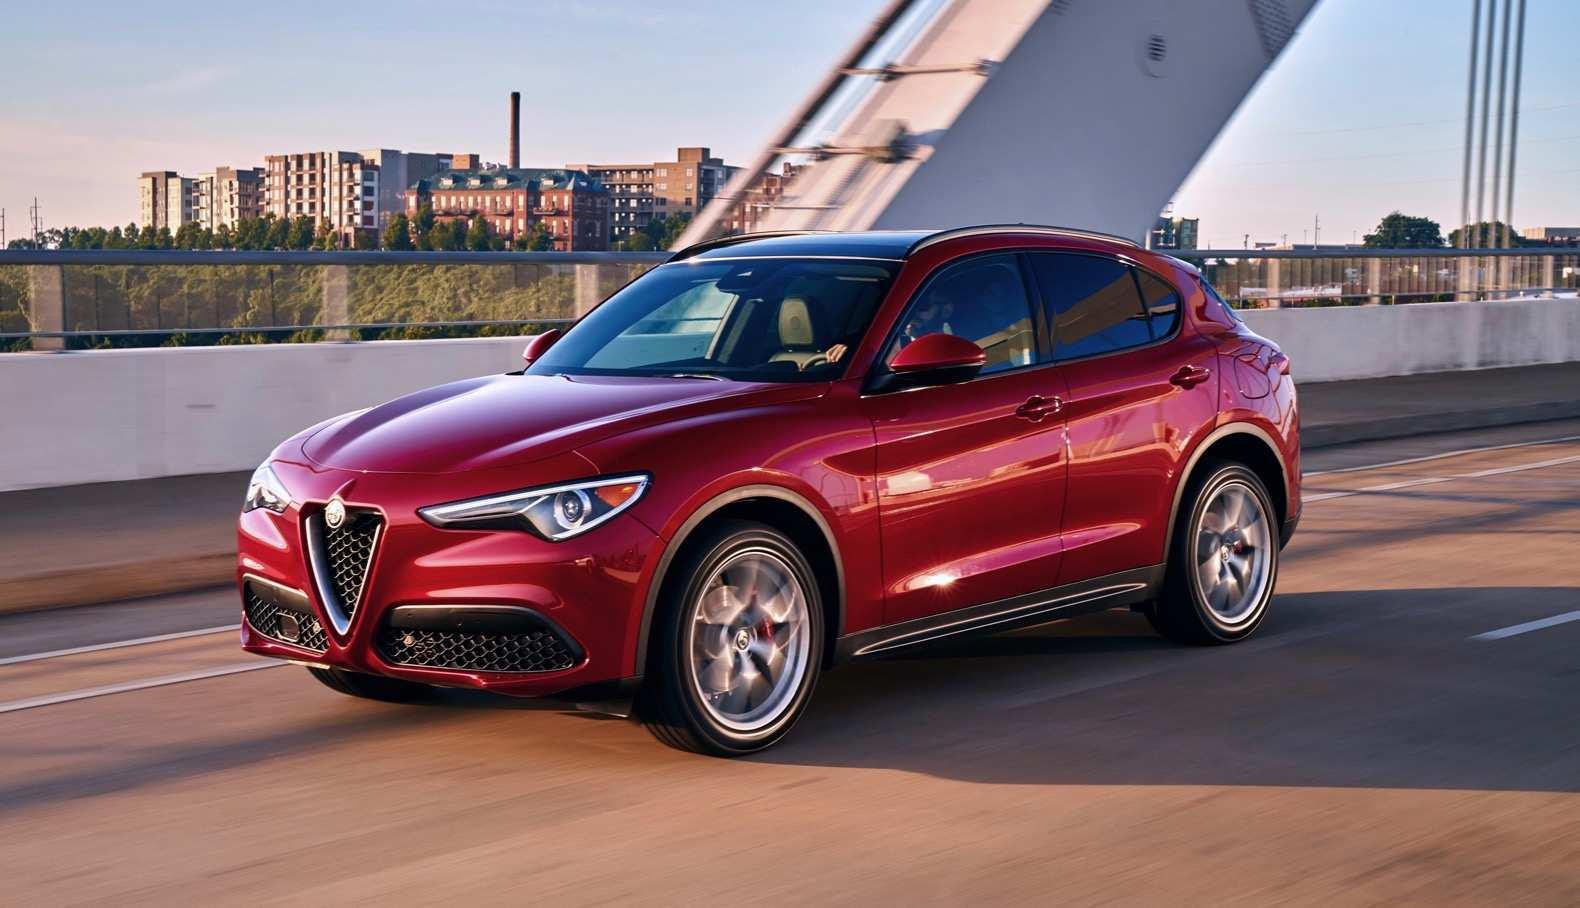 13 Best Review 2020 Alfa Romeo Suv Price by 2020 Alfa Romeo Suv